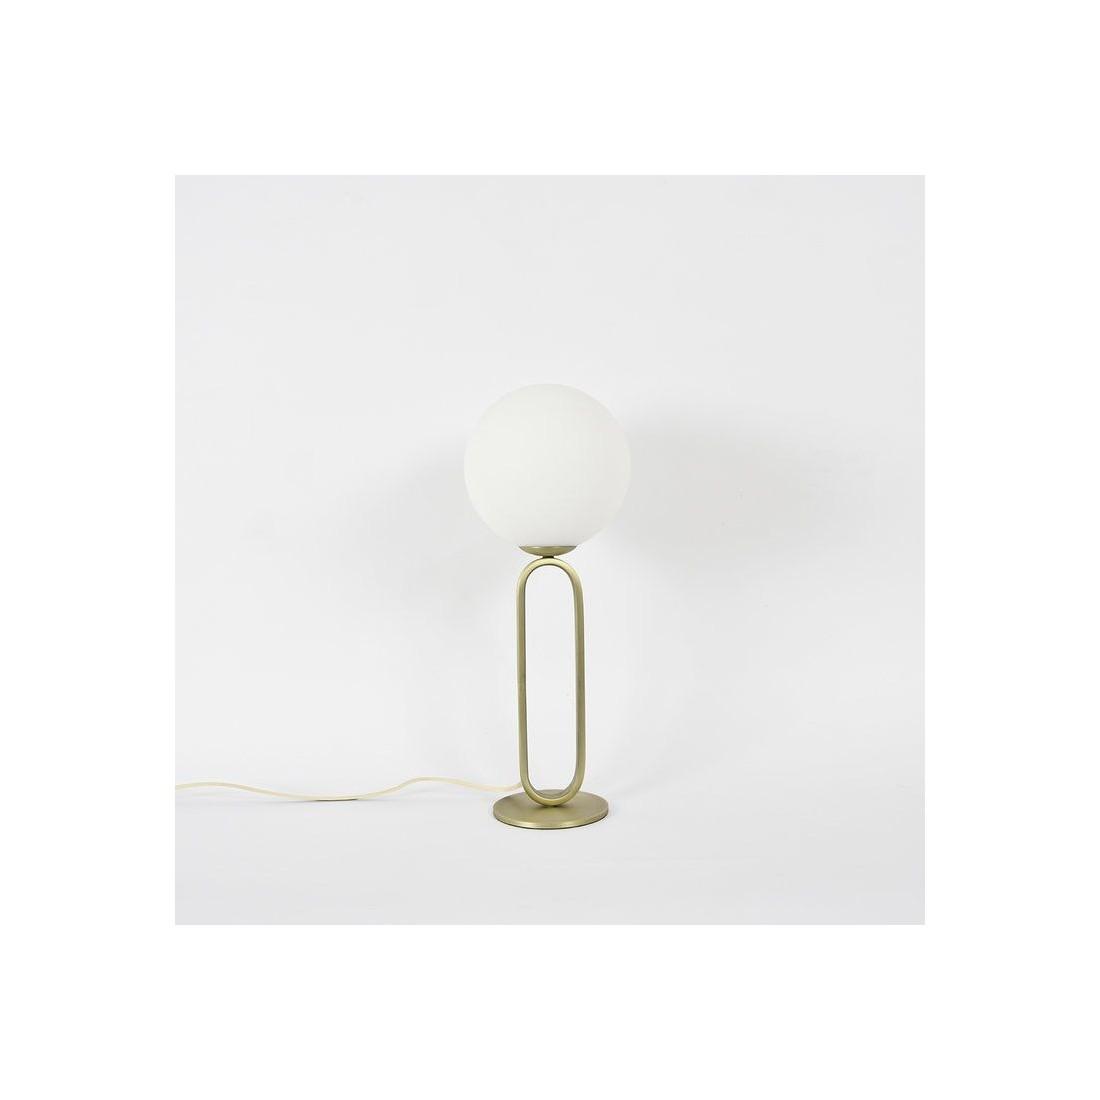 Lampe à poser Cime Eno Studio / 20cm